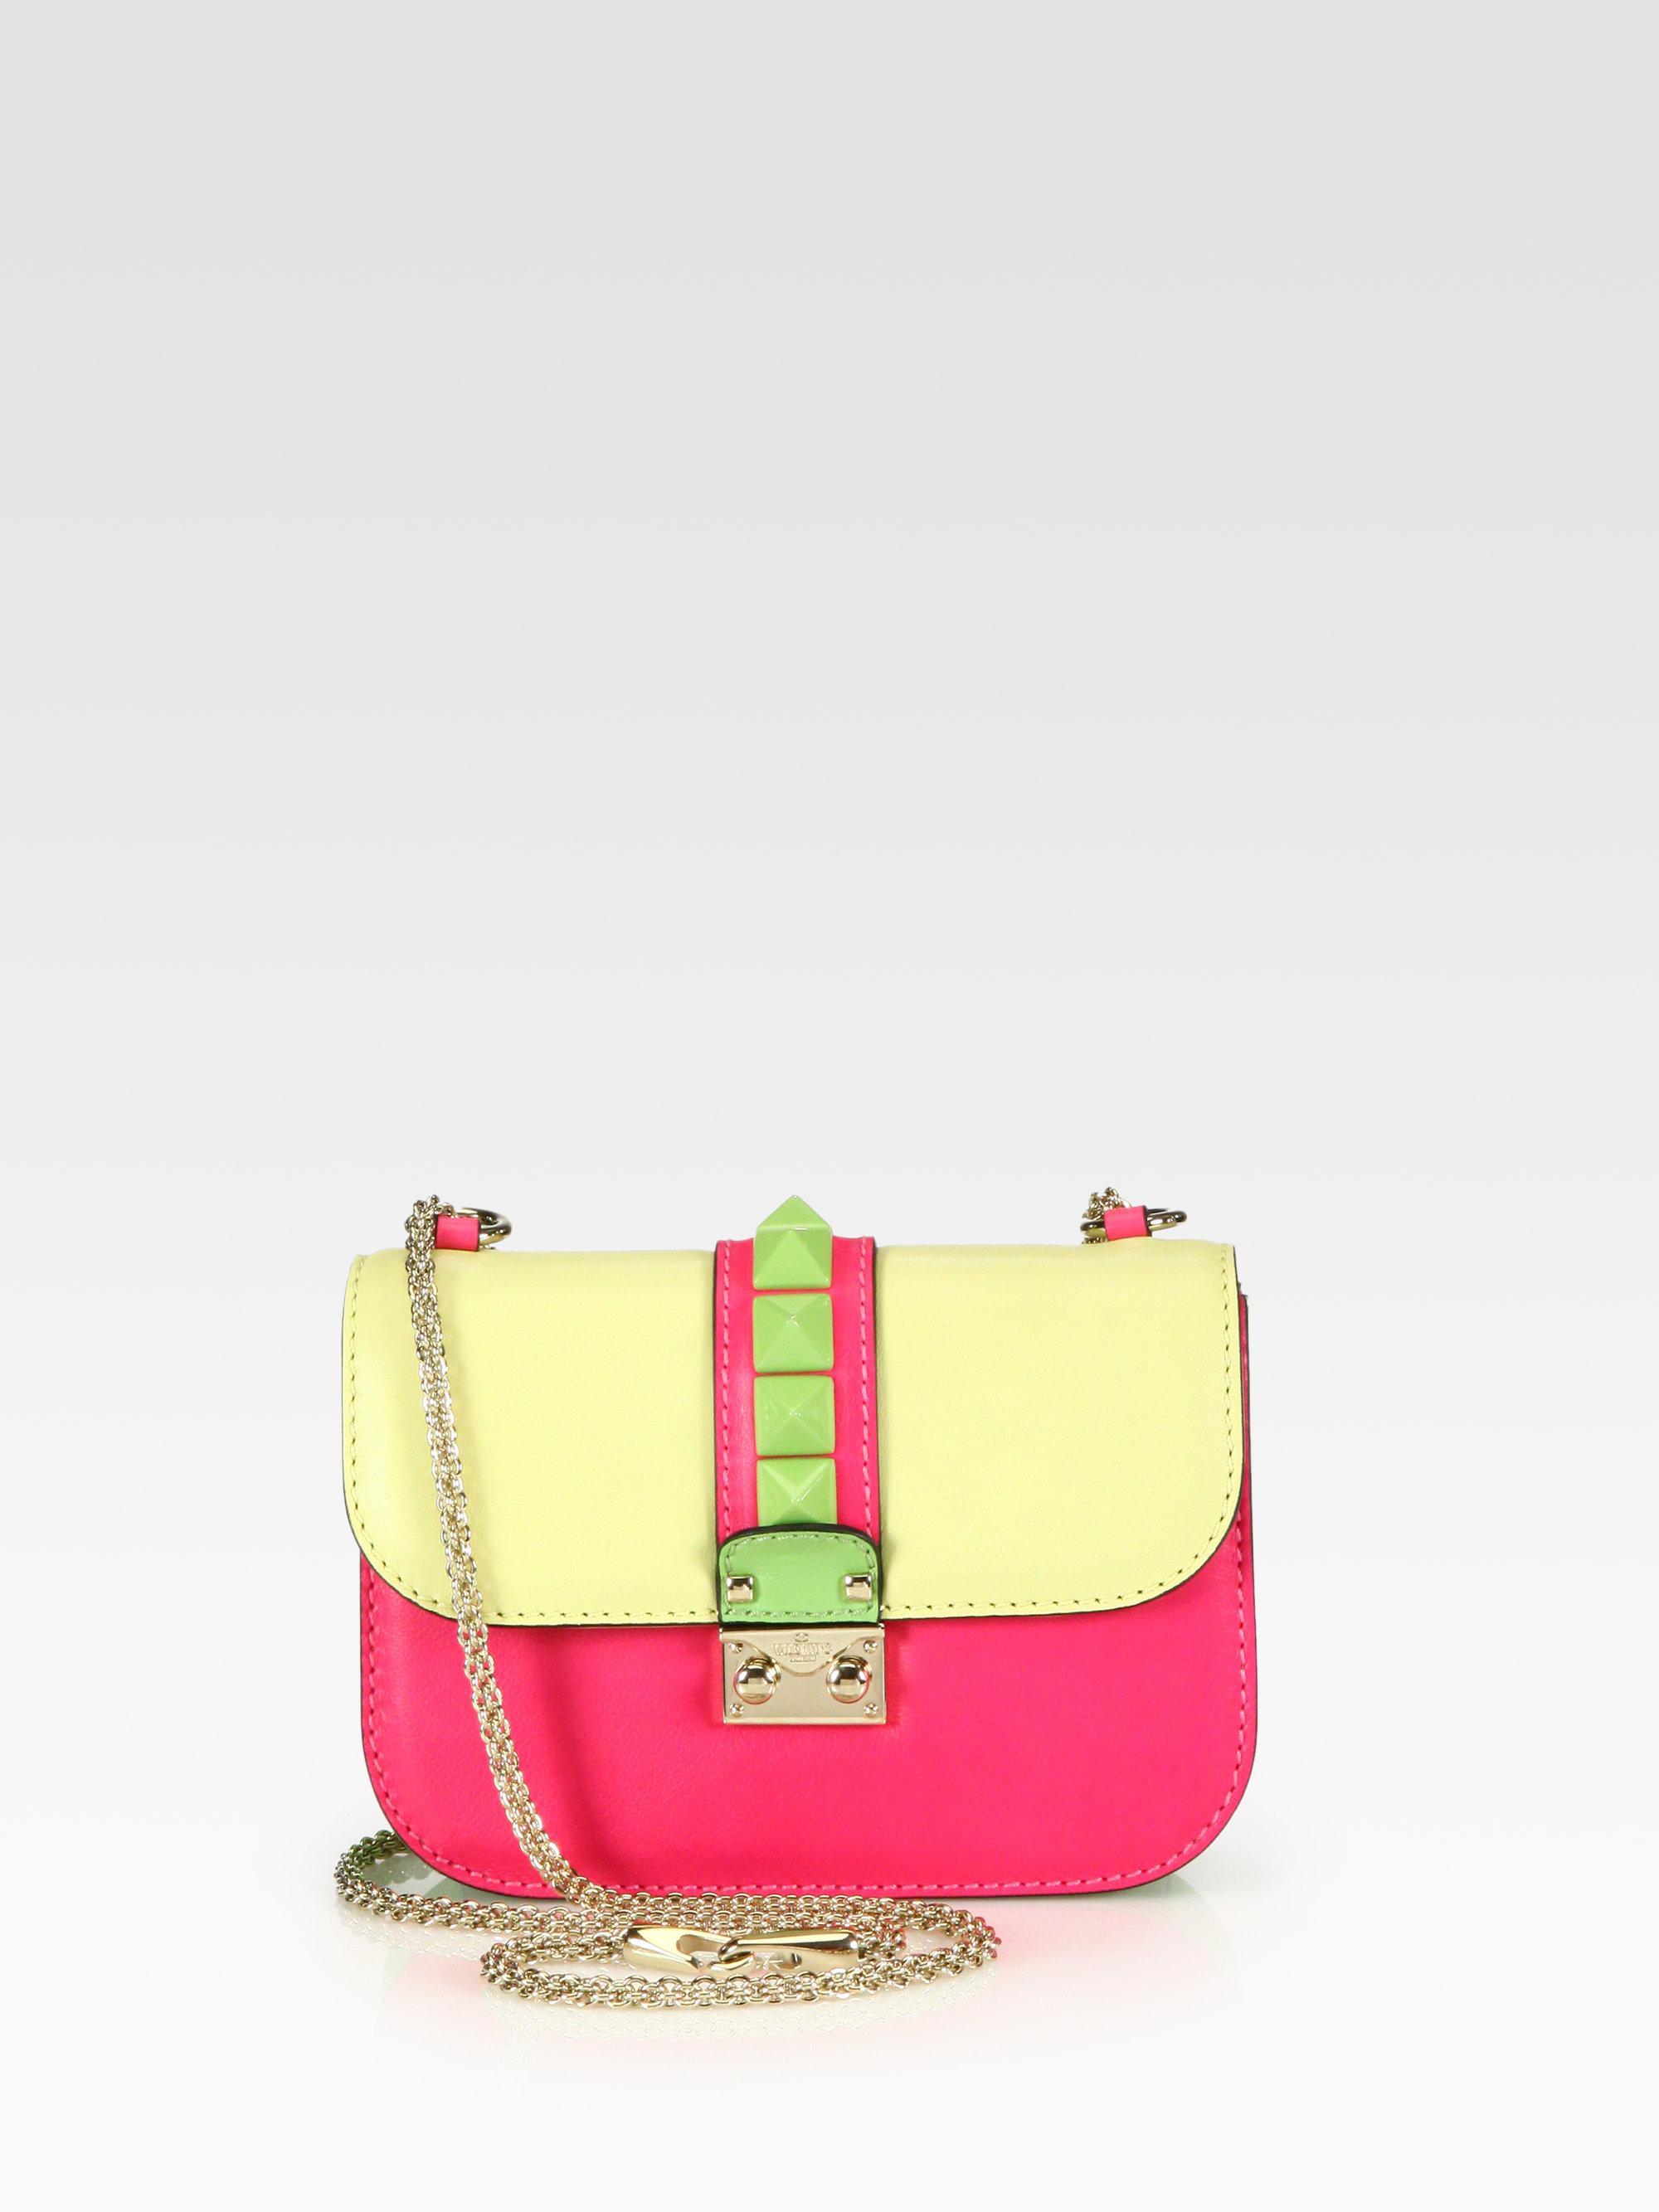 Valentino Colorblock Flap Shoulder Bag 22